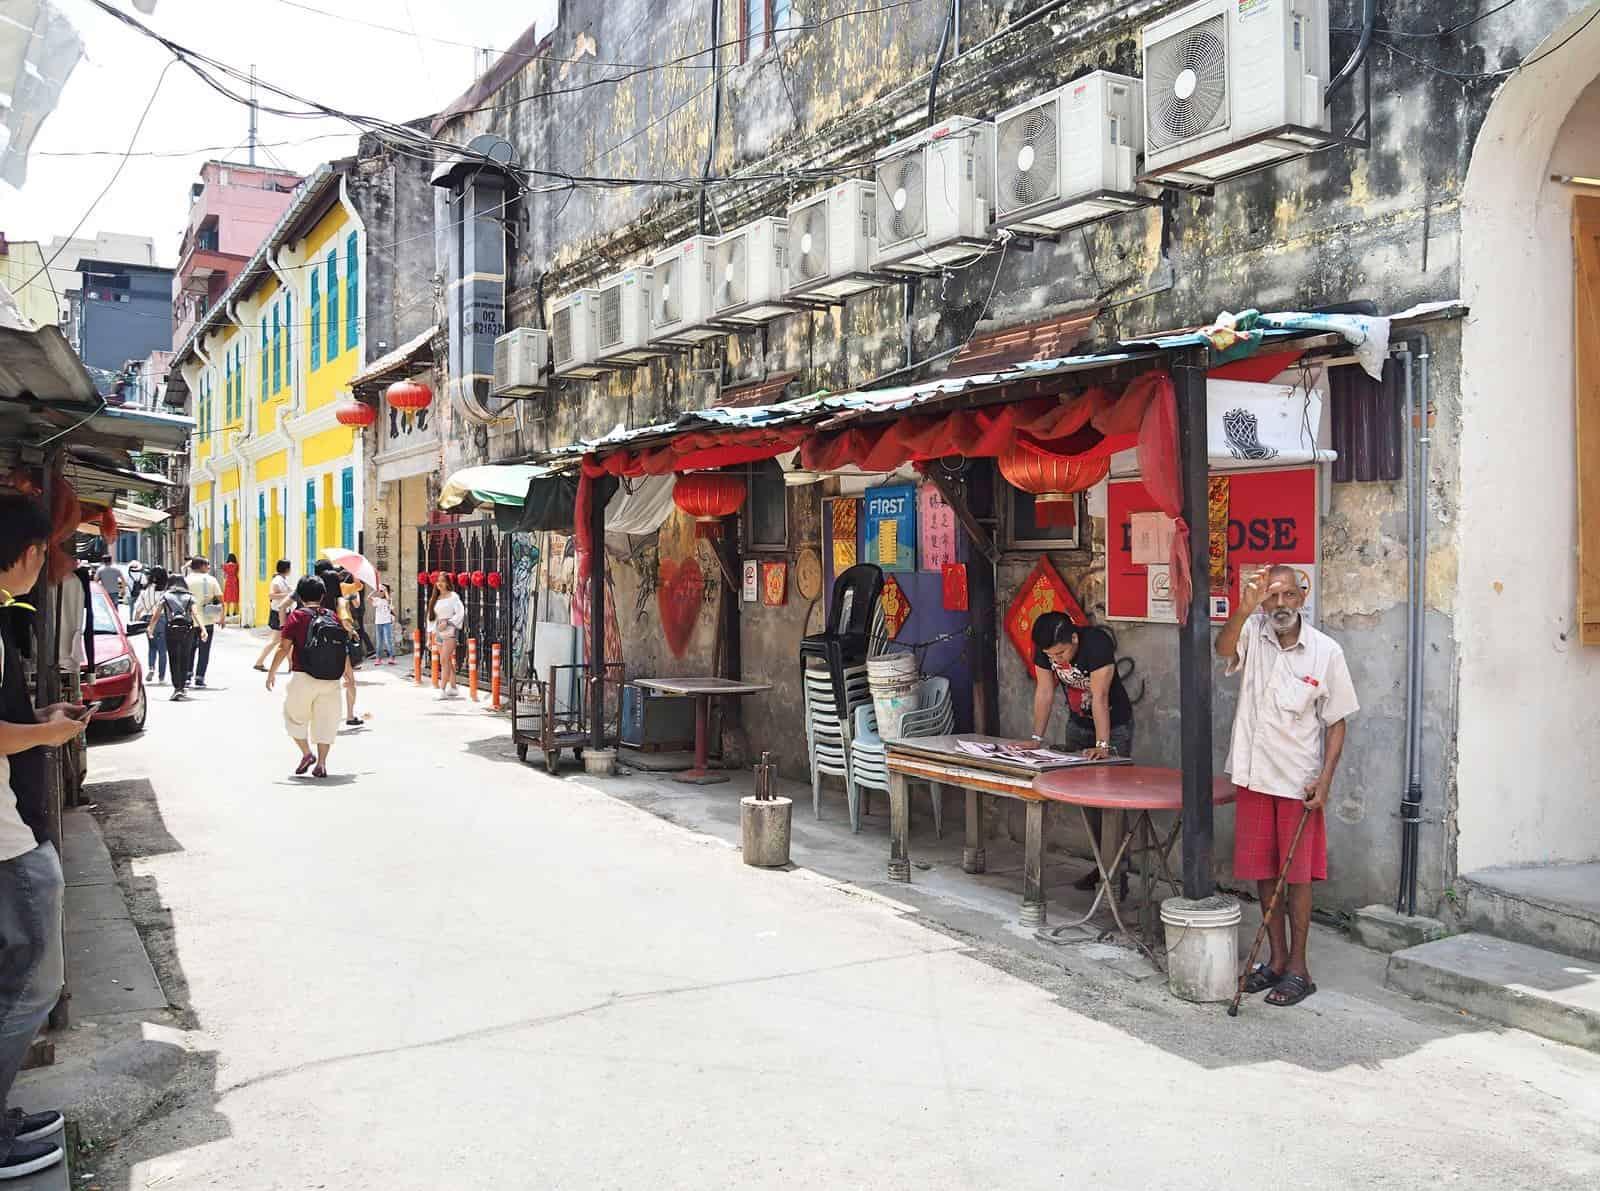 Kwai Chai Hong heritage lane in Kuala Lumpur's Chinatown